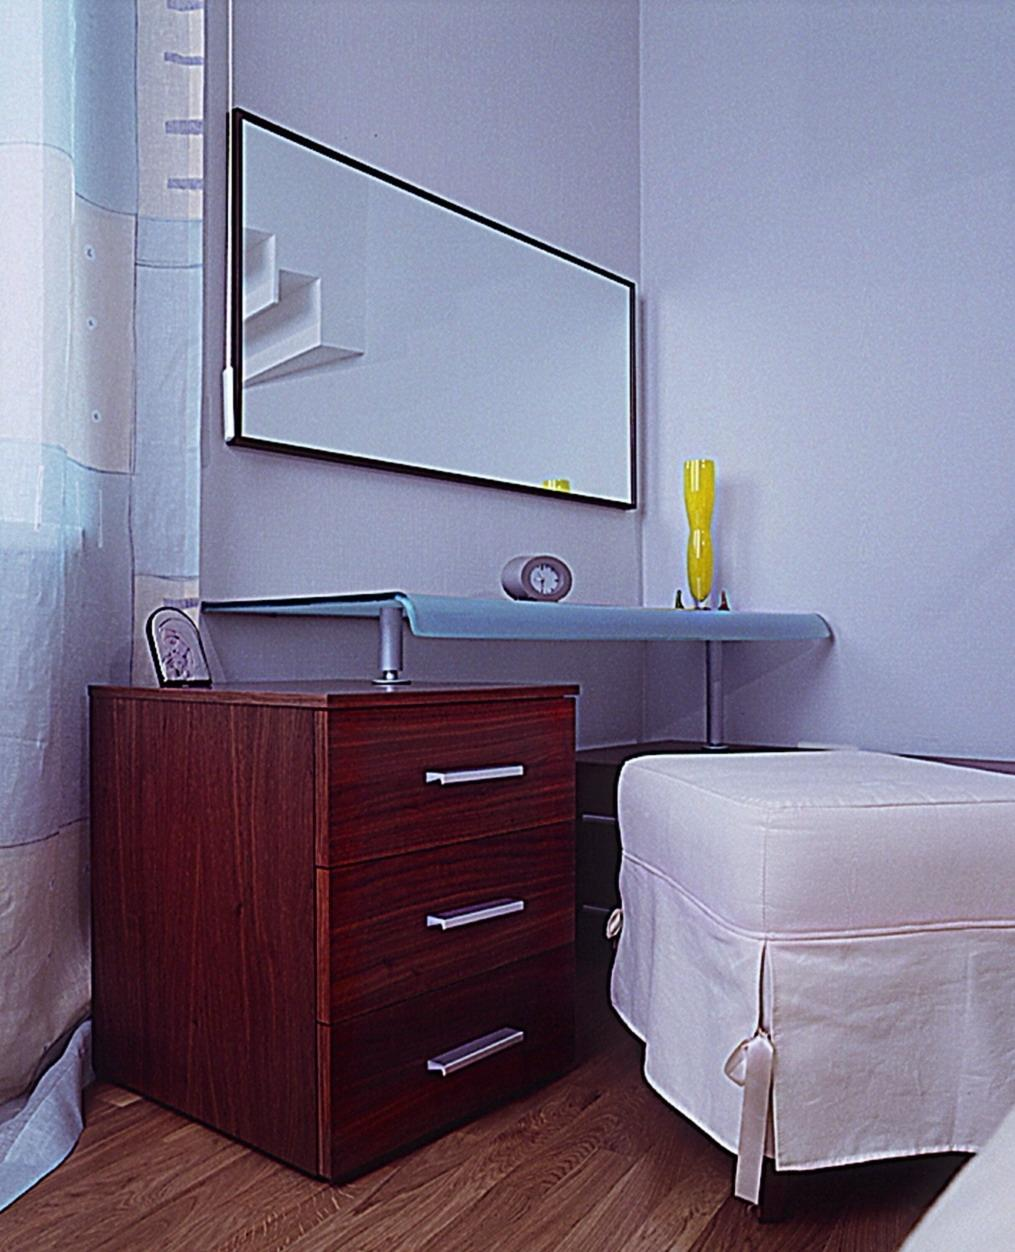 3-к квартира   Краснодар, Кубанская, р-н ЧМР, 45 фото - 1